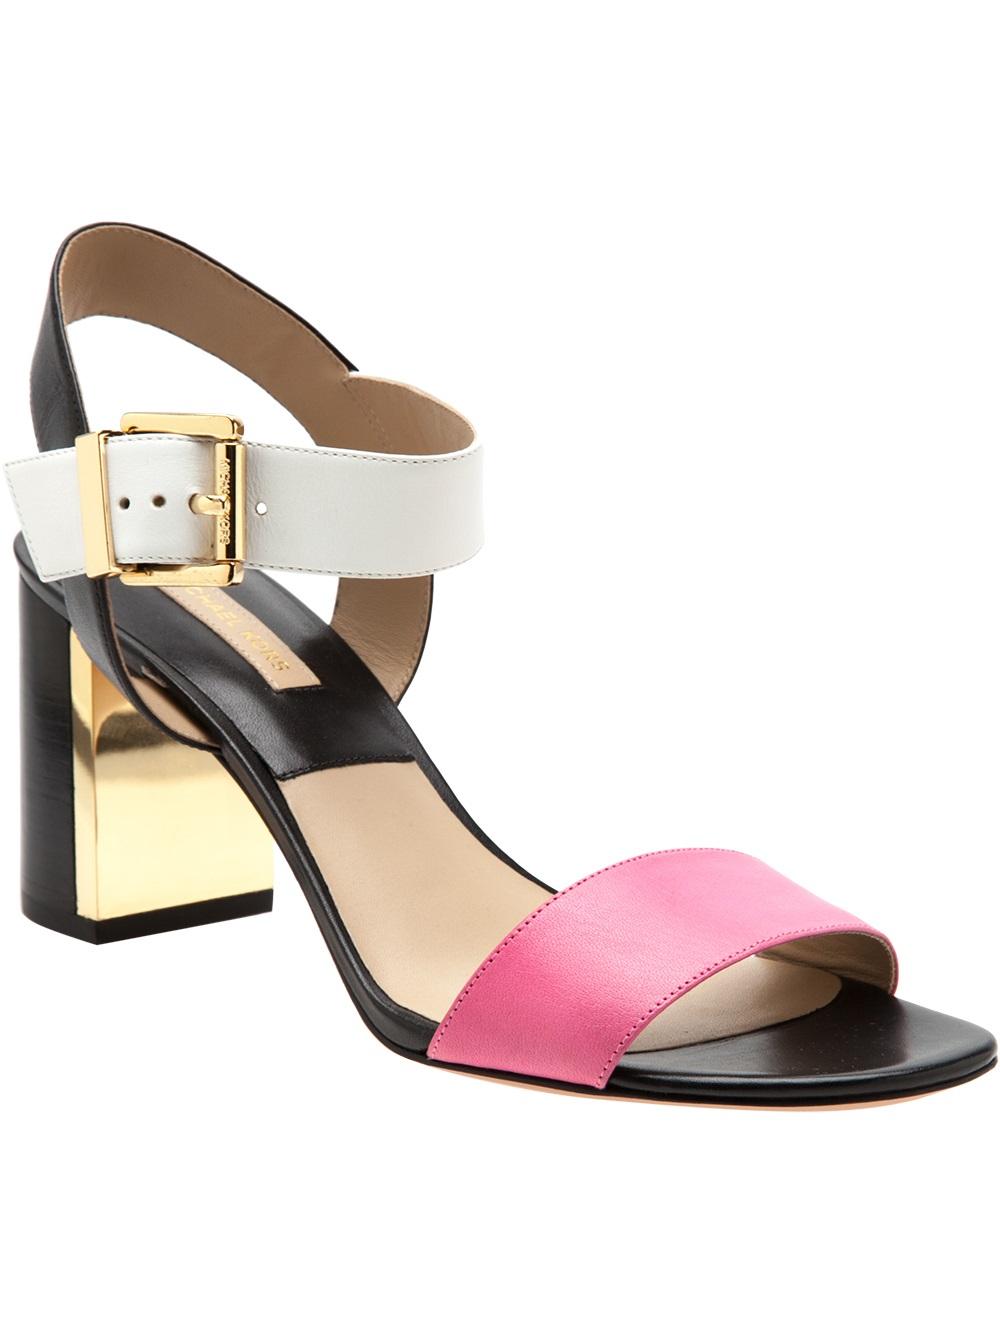 Michael Kors Chunky Heel Sandal In Pink Lyst